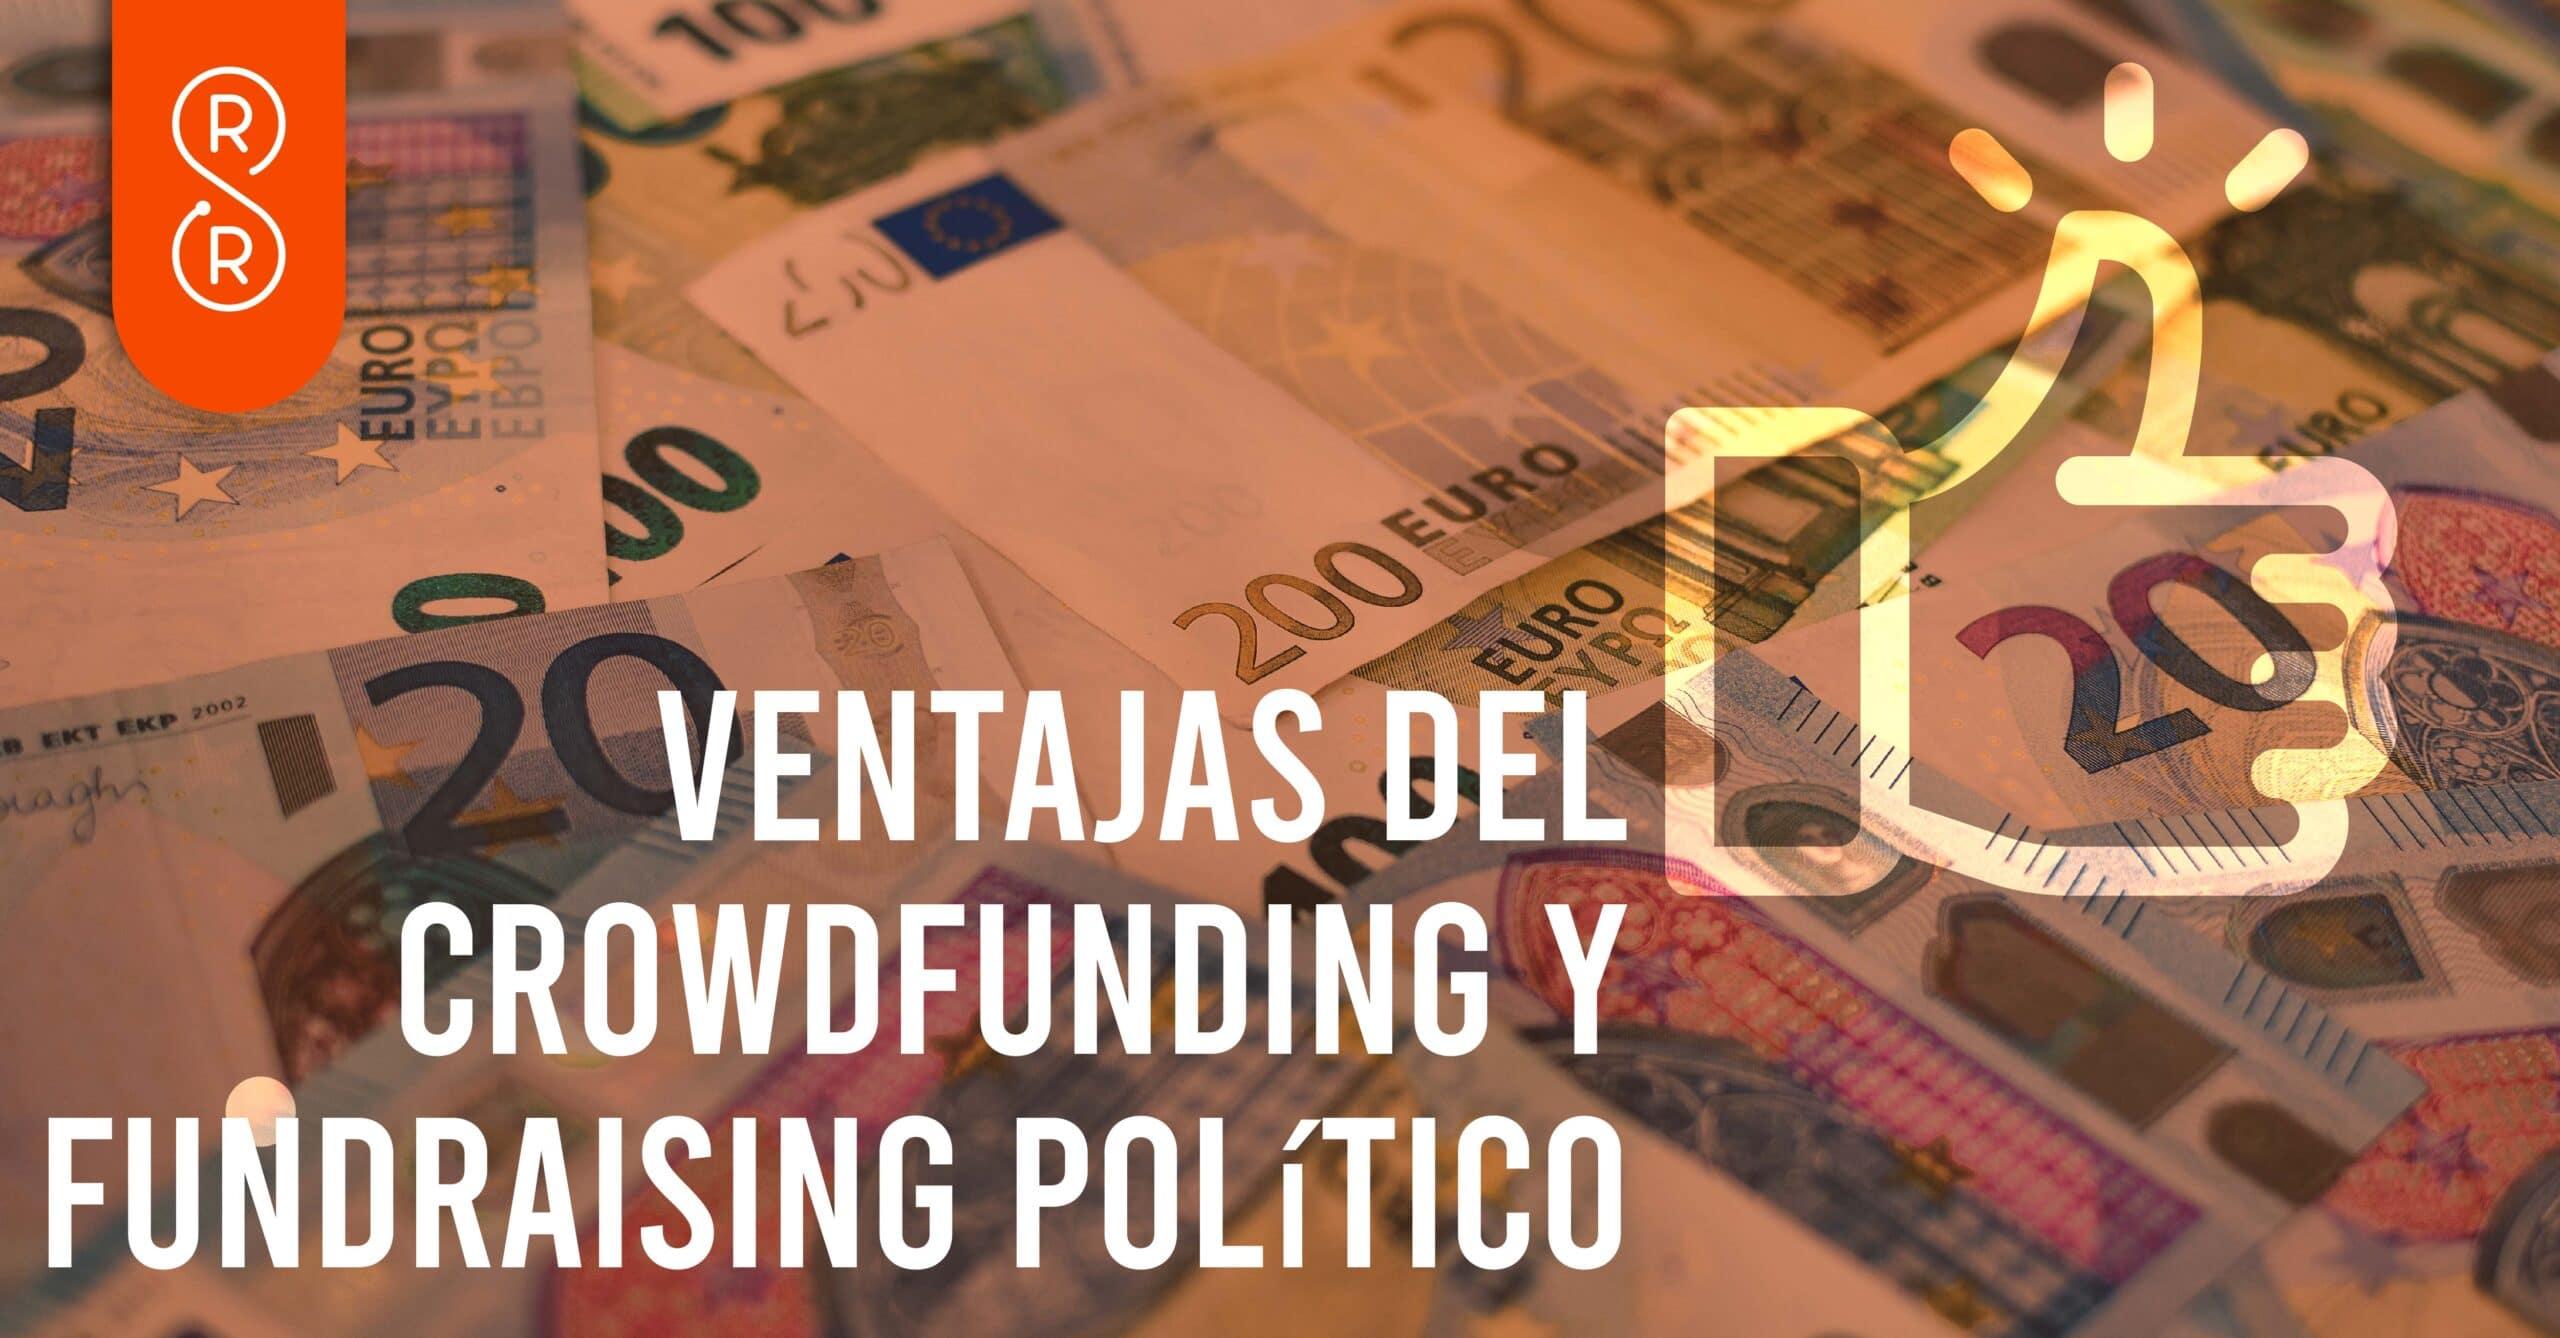 crowdfunding fundraising politico.jpg scaled